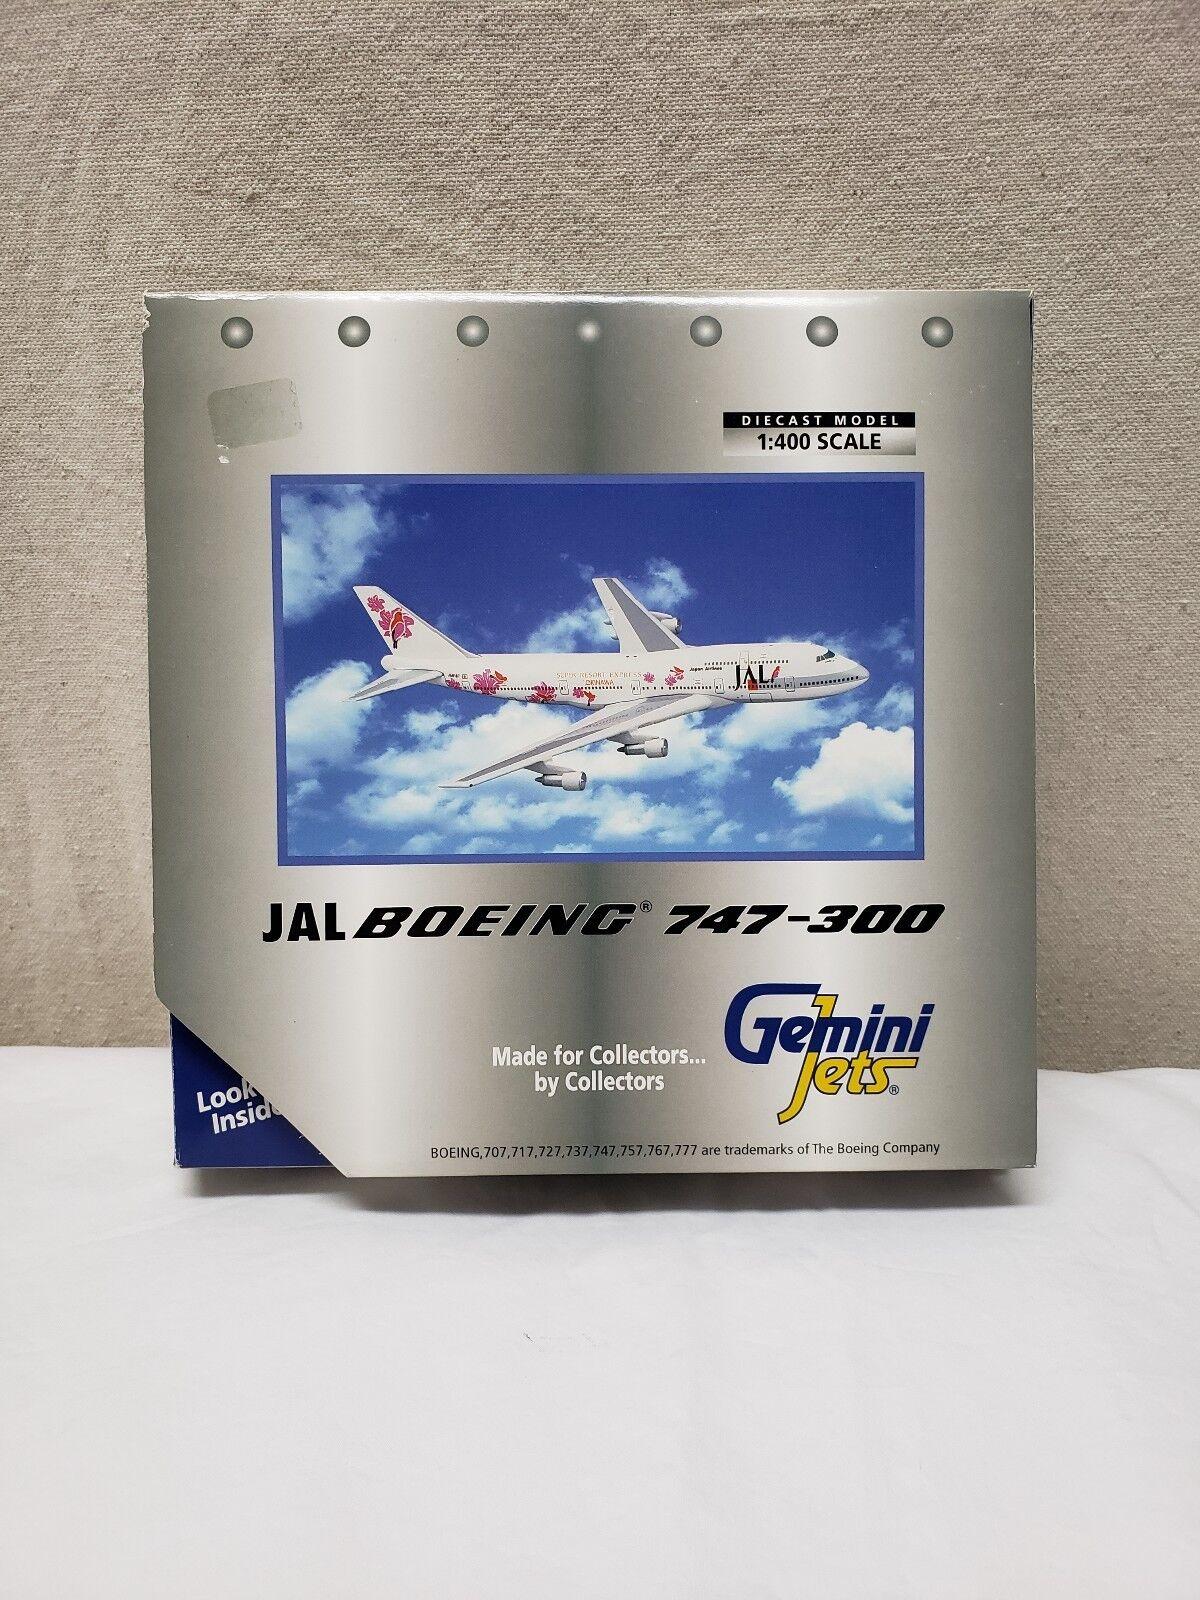 Jal Boeing 747-300 Gemini Jets Diecast Model 1 400 Scale Airplane Aviation Jet